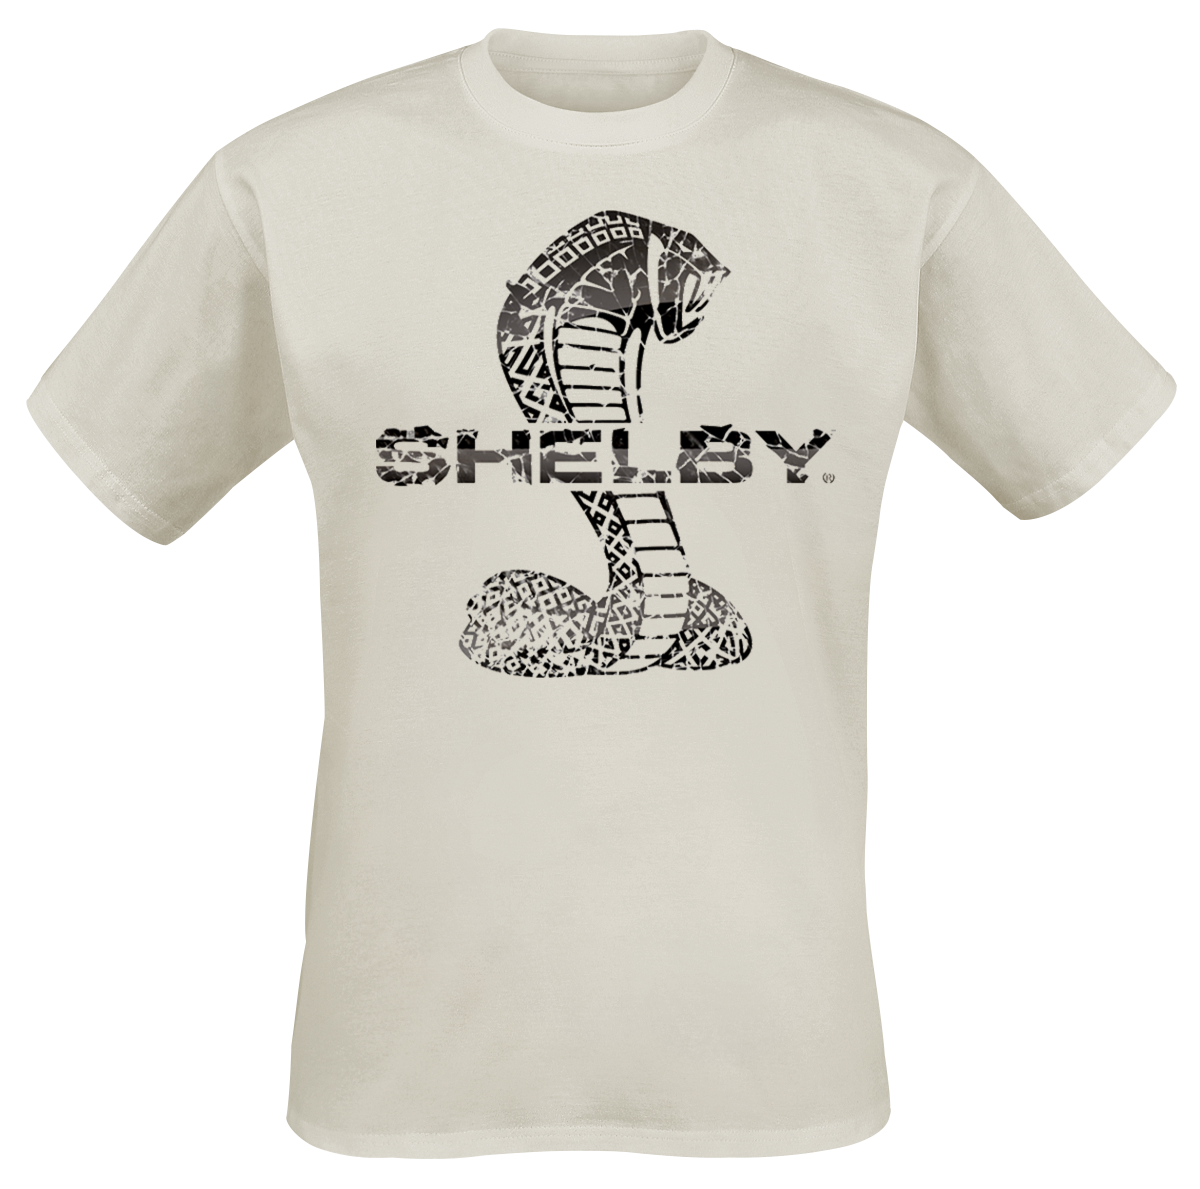 Shelby - Cracked Snake - T-Shirt - beige image